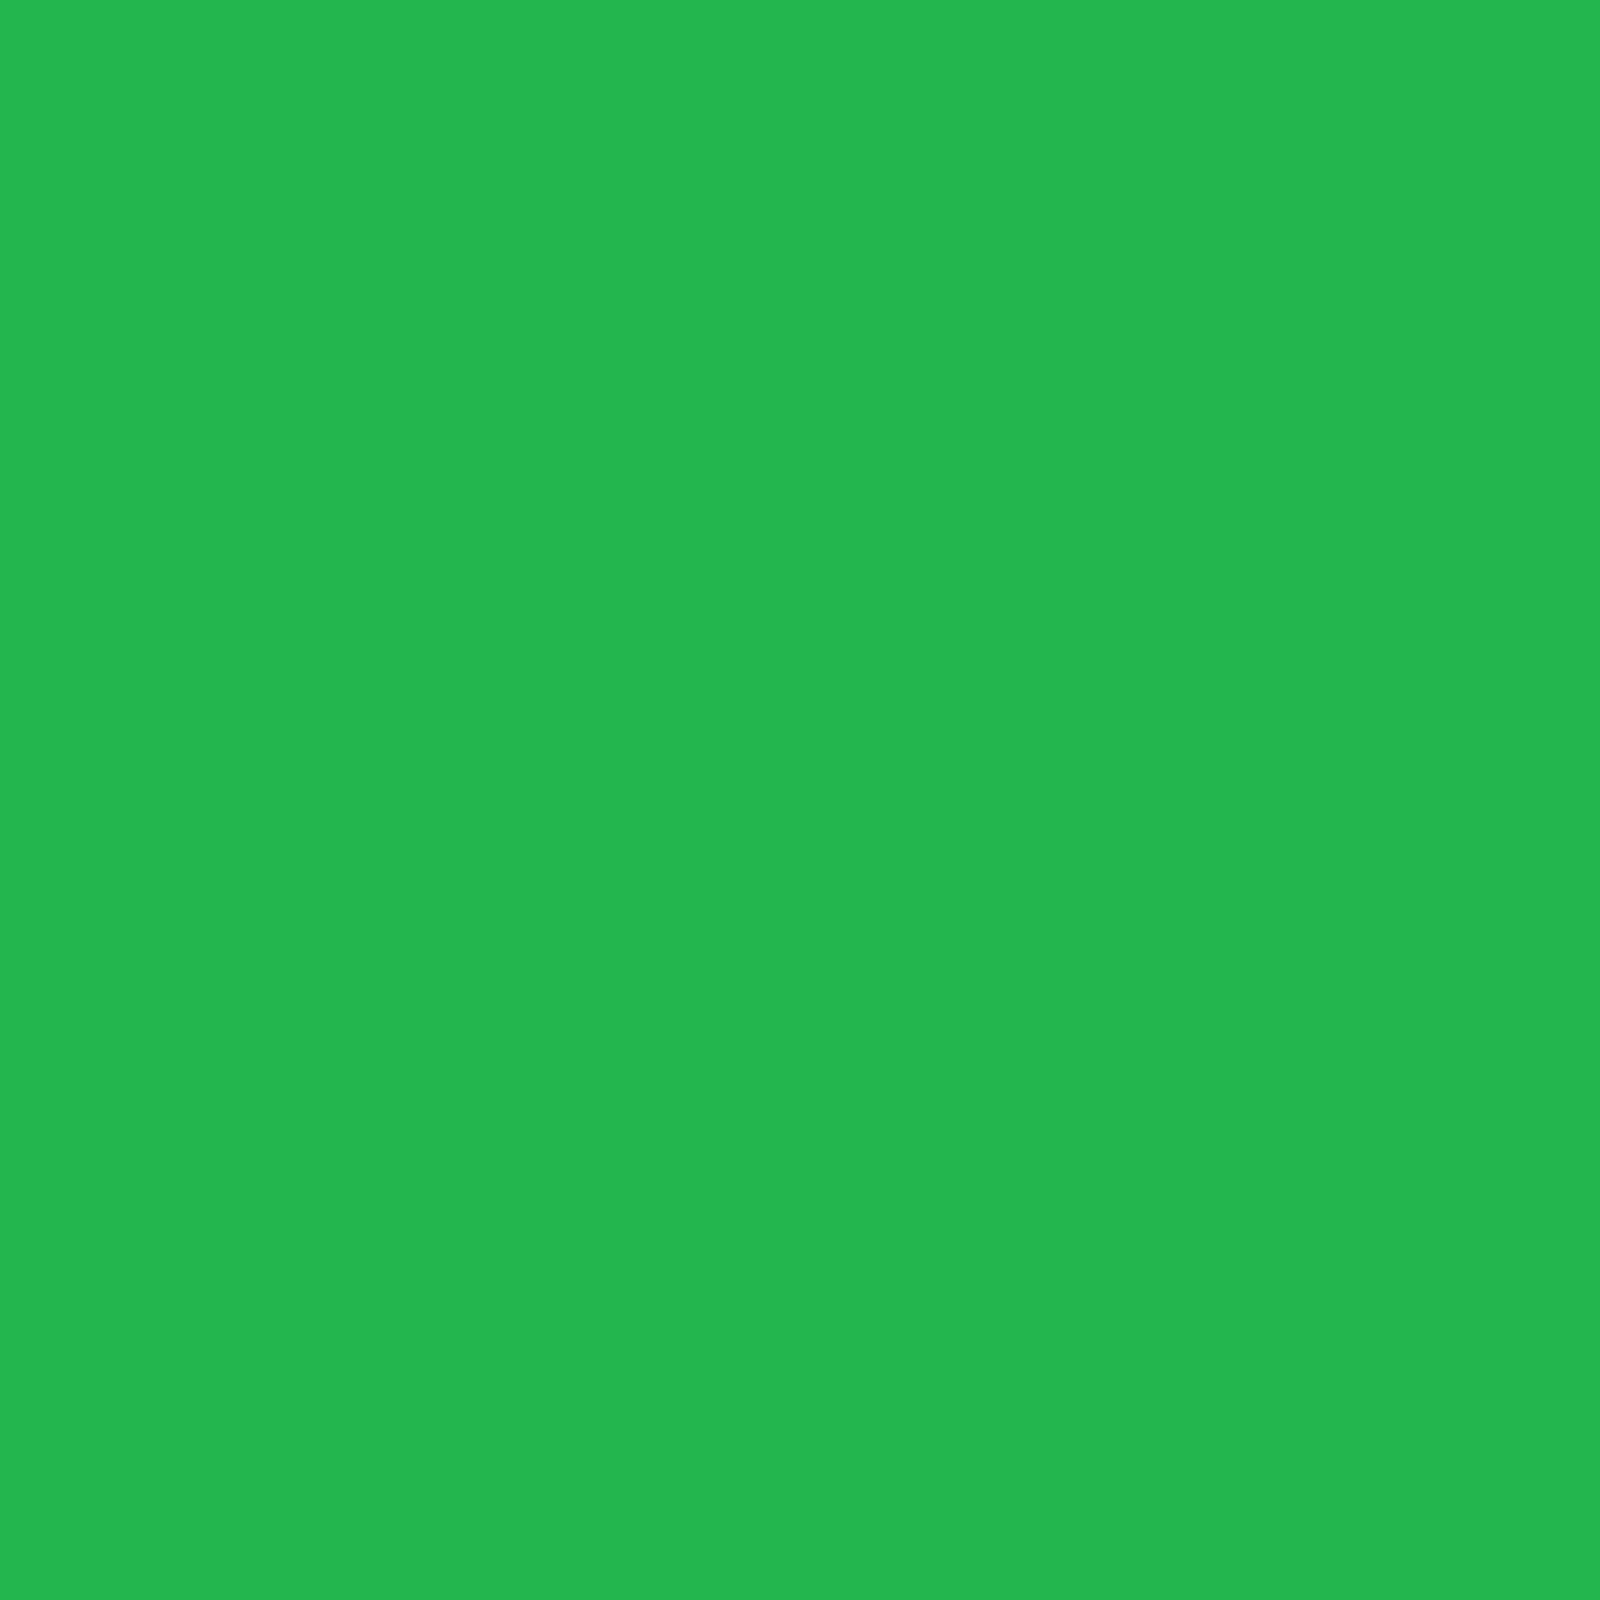 kobra verde anacondă